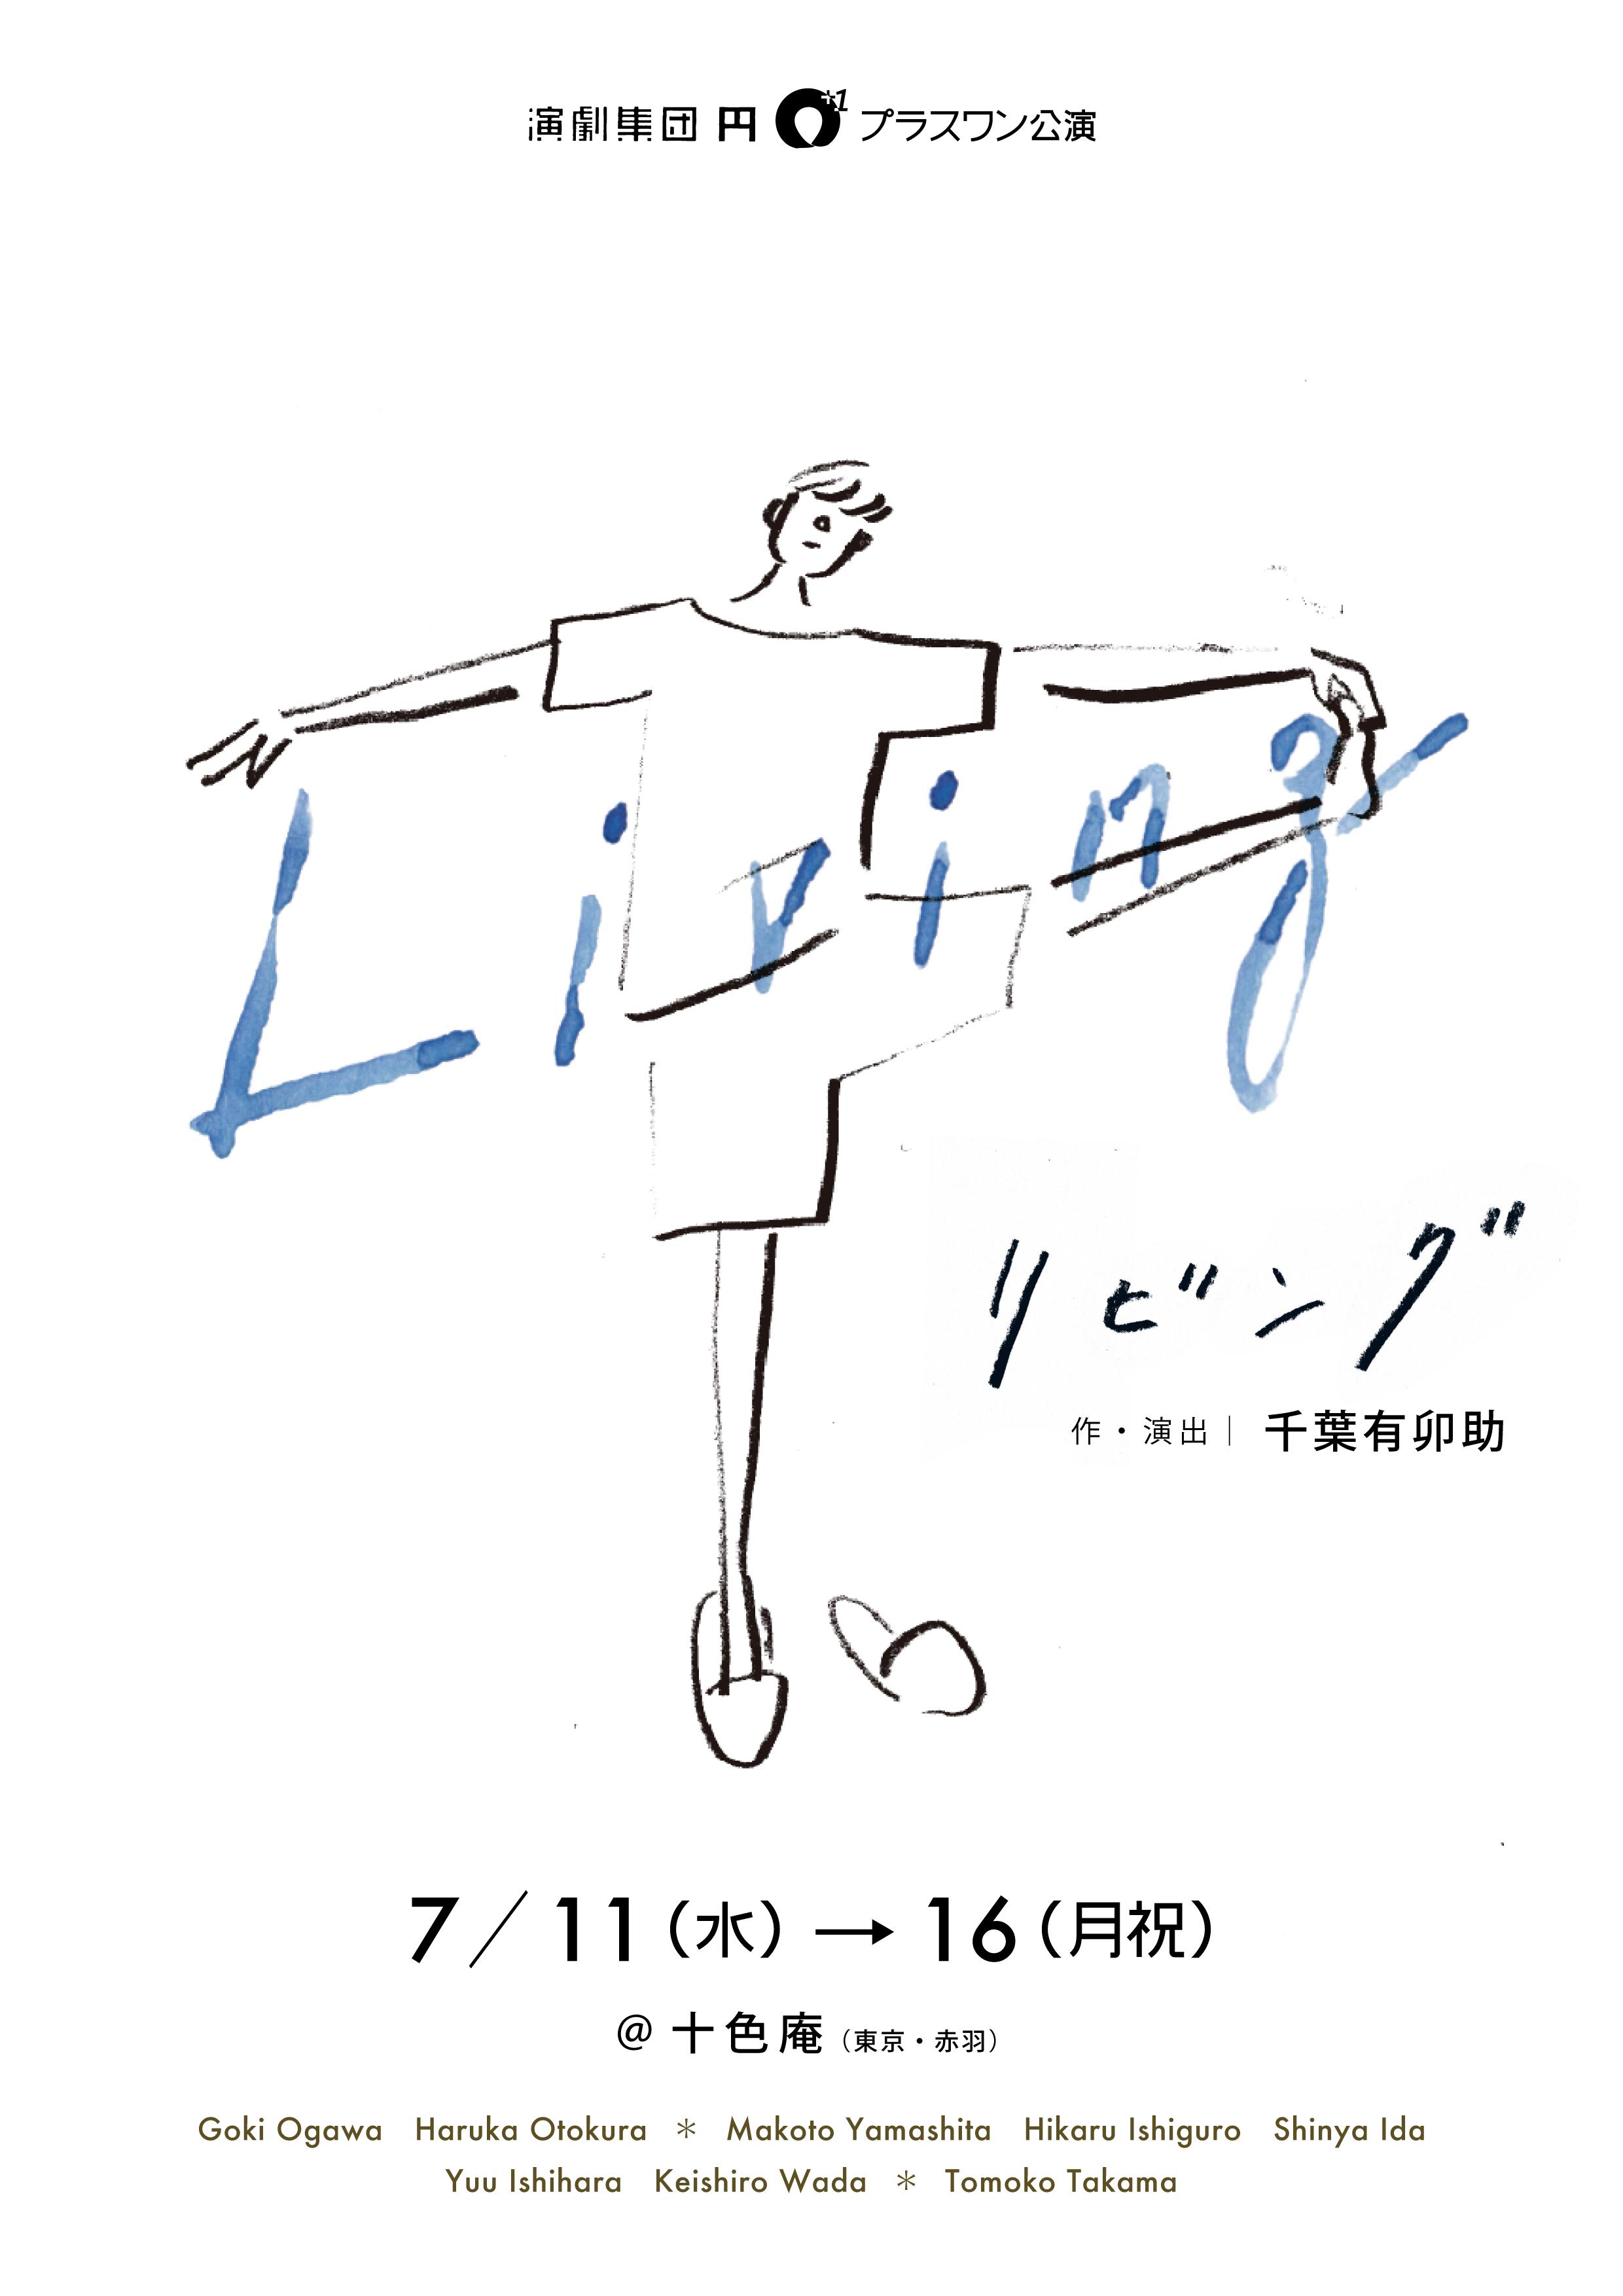 Living-リビング-    2018 c: 演劇集団円  AD: 千葉 有卯助